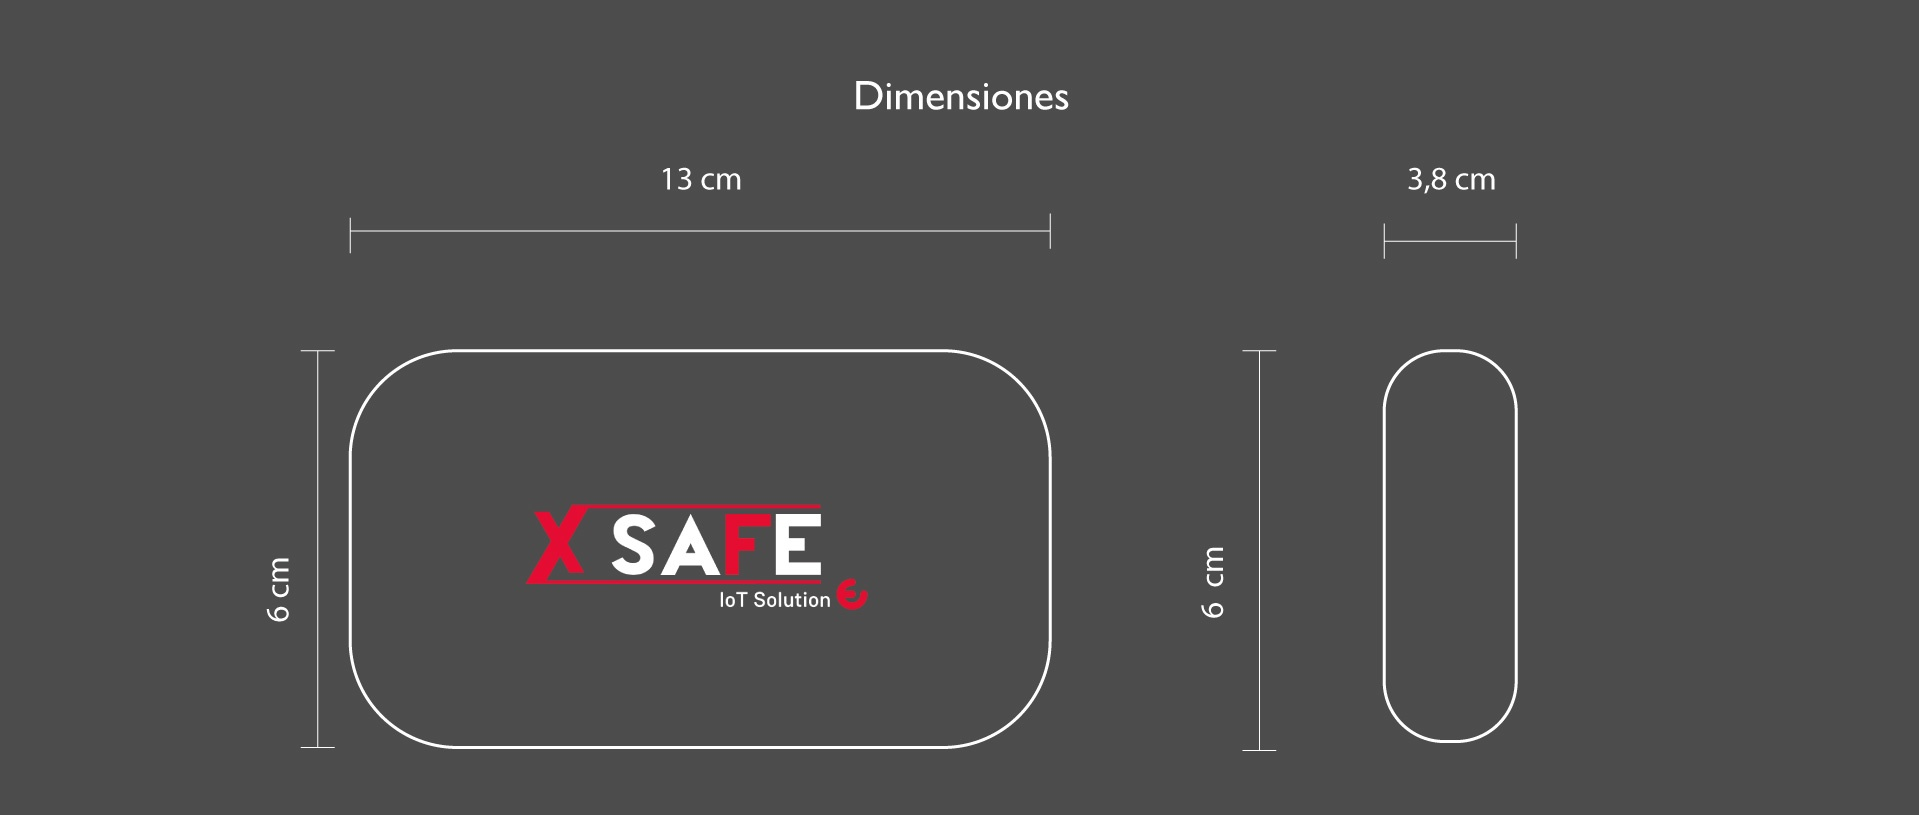 X Safe Dimensiones